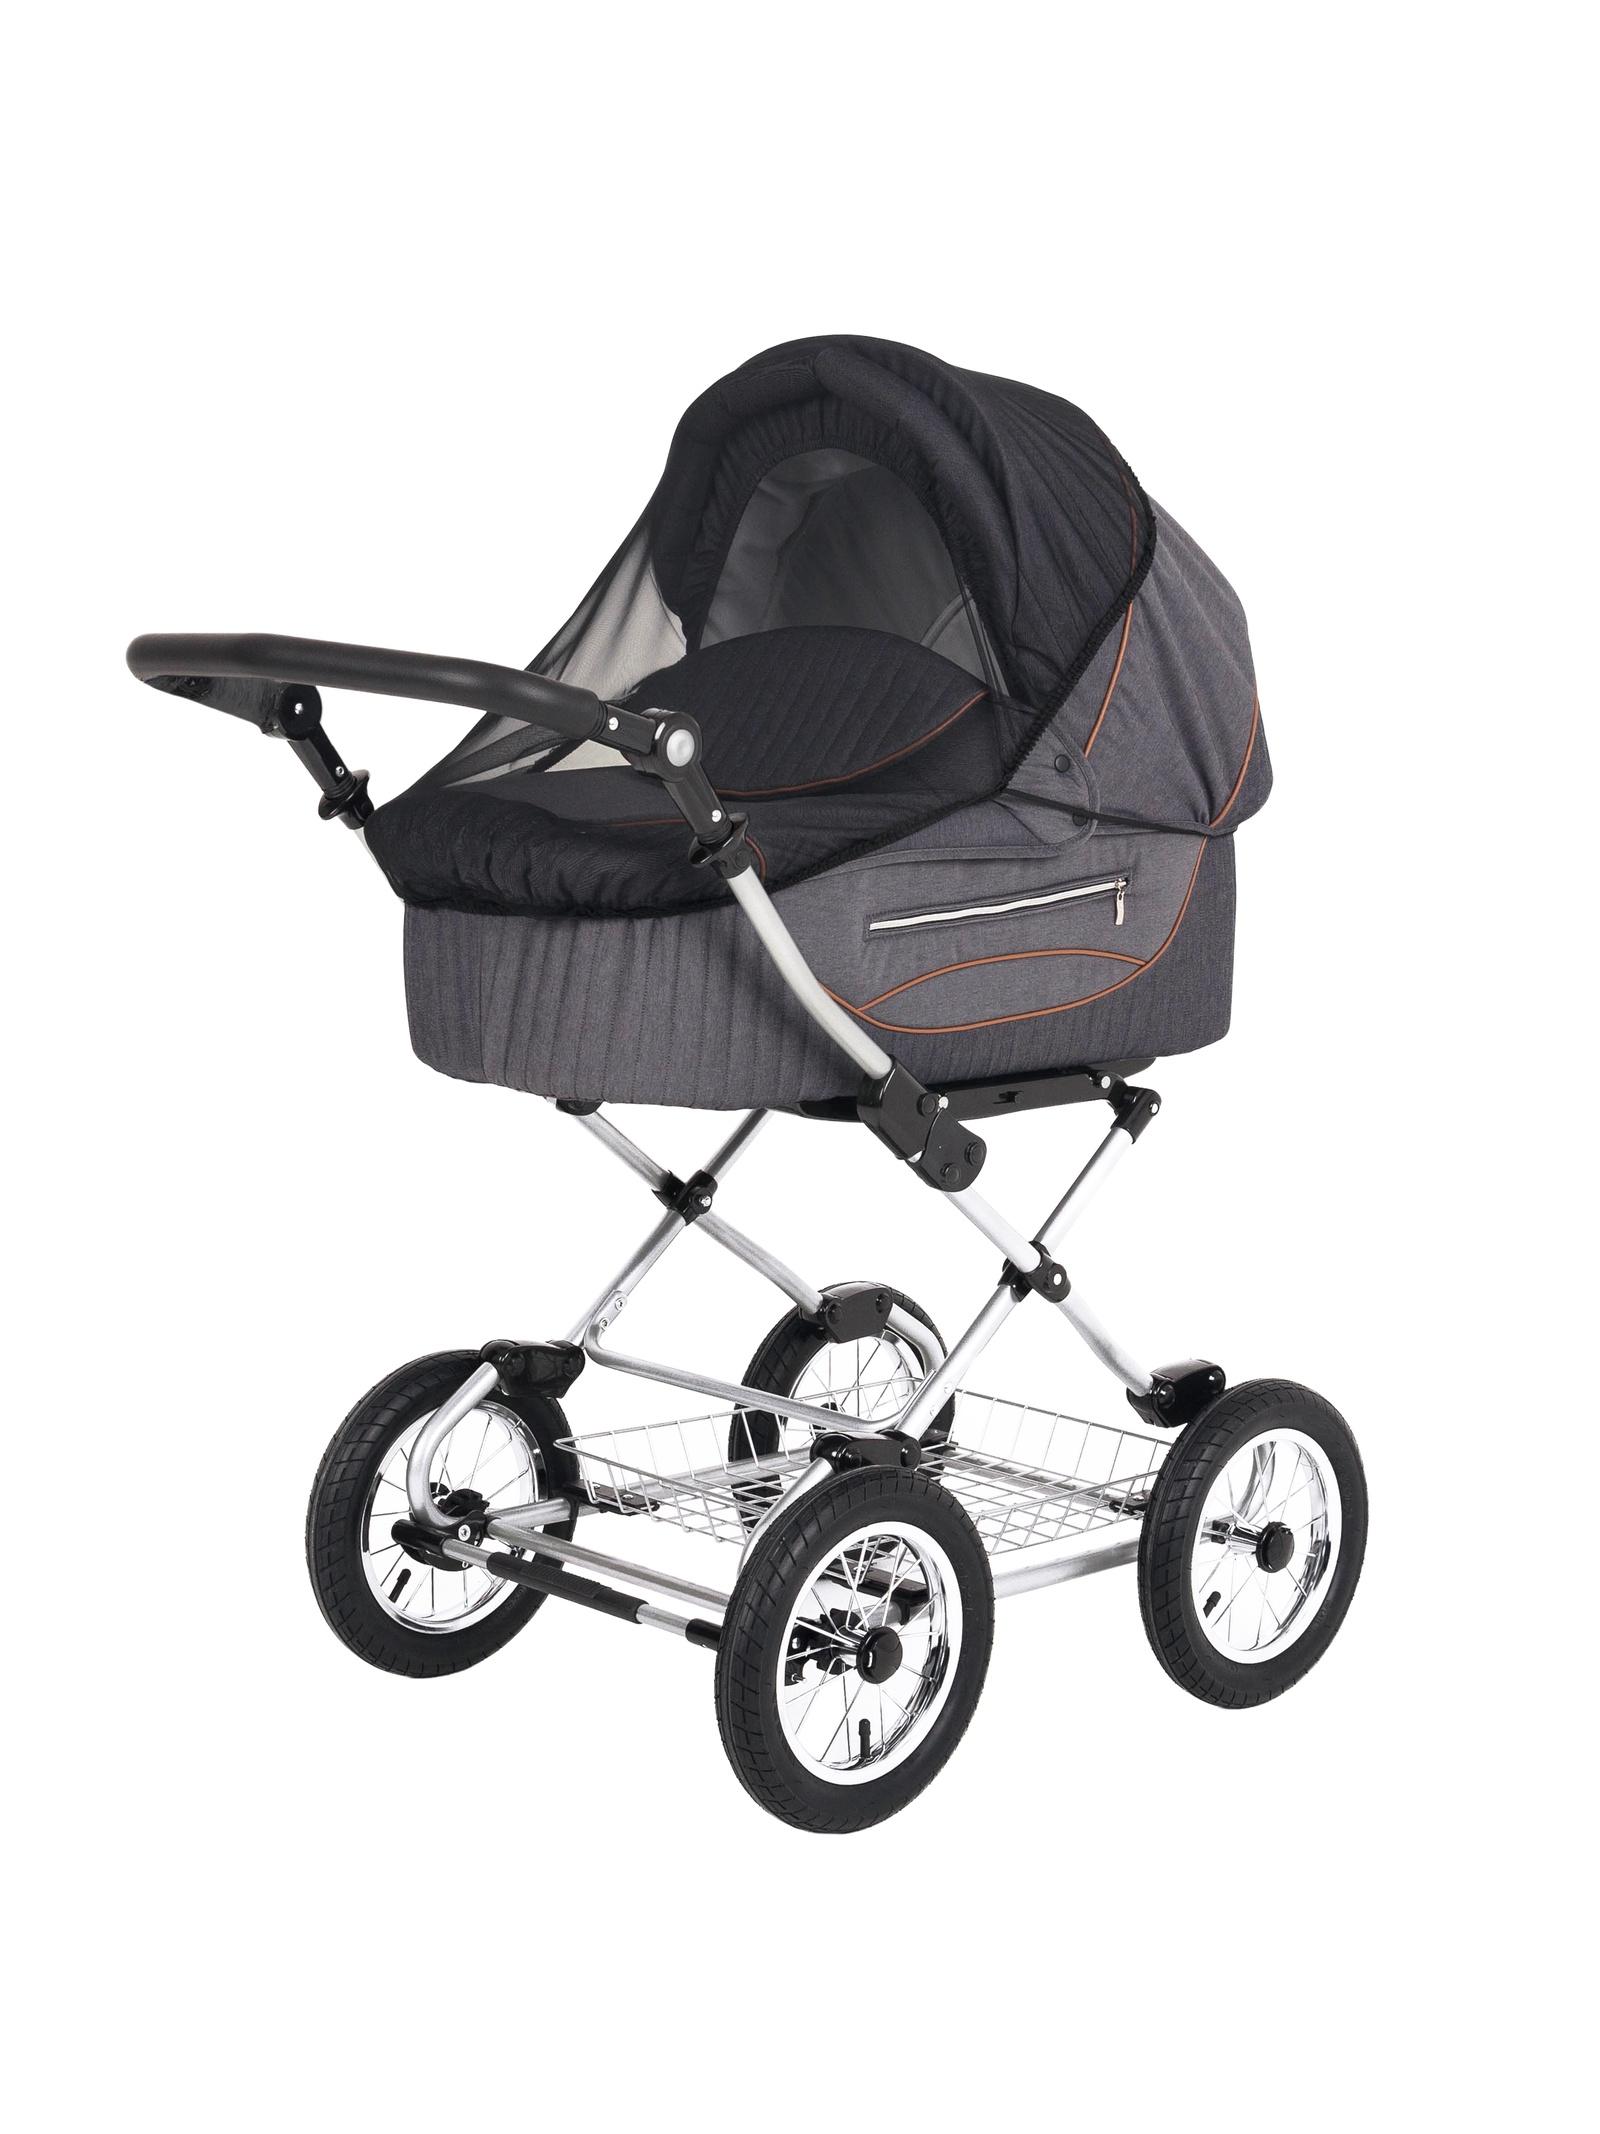 Аксессуар для колясок Trottola Москитная сетка на коляску люльку SUMMER NET CLASSIC черный москитная сетка baby care classic plus белая